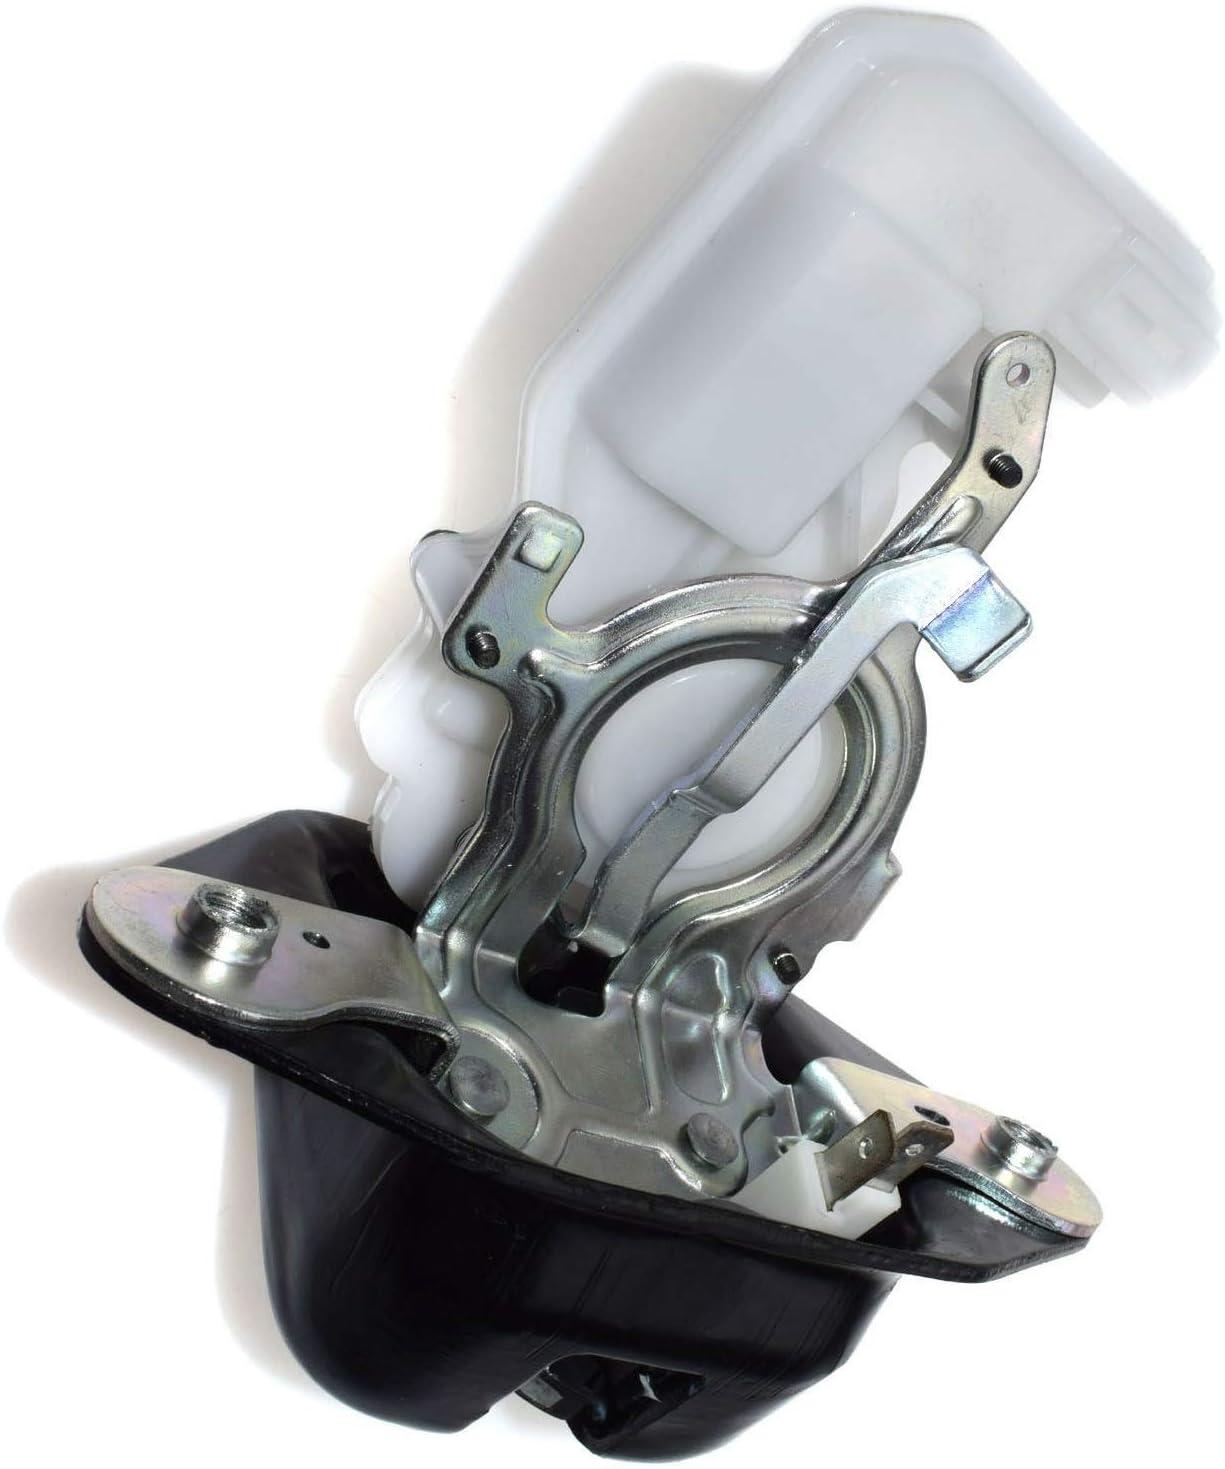 CRV HY-SPEED 719-810 Trunk Lock Assembly 74800-SMG-G01 Trunk Door Latch Tailgate Liftgate Actuator For 2007 2008 2009 2010 2011 07 08 09 10 11 Honda CR-V 2009 2010 2011 Honda Pilot